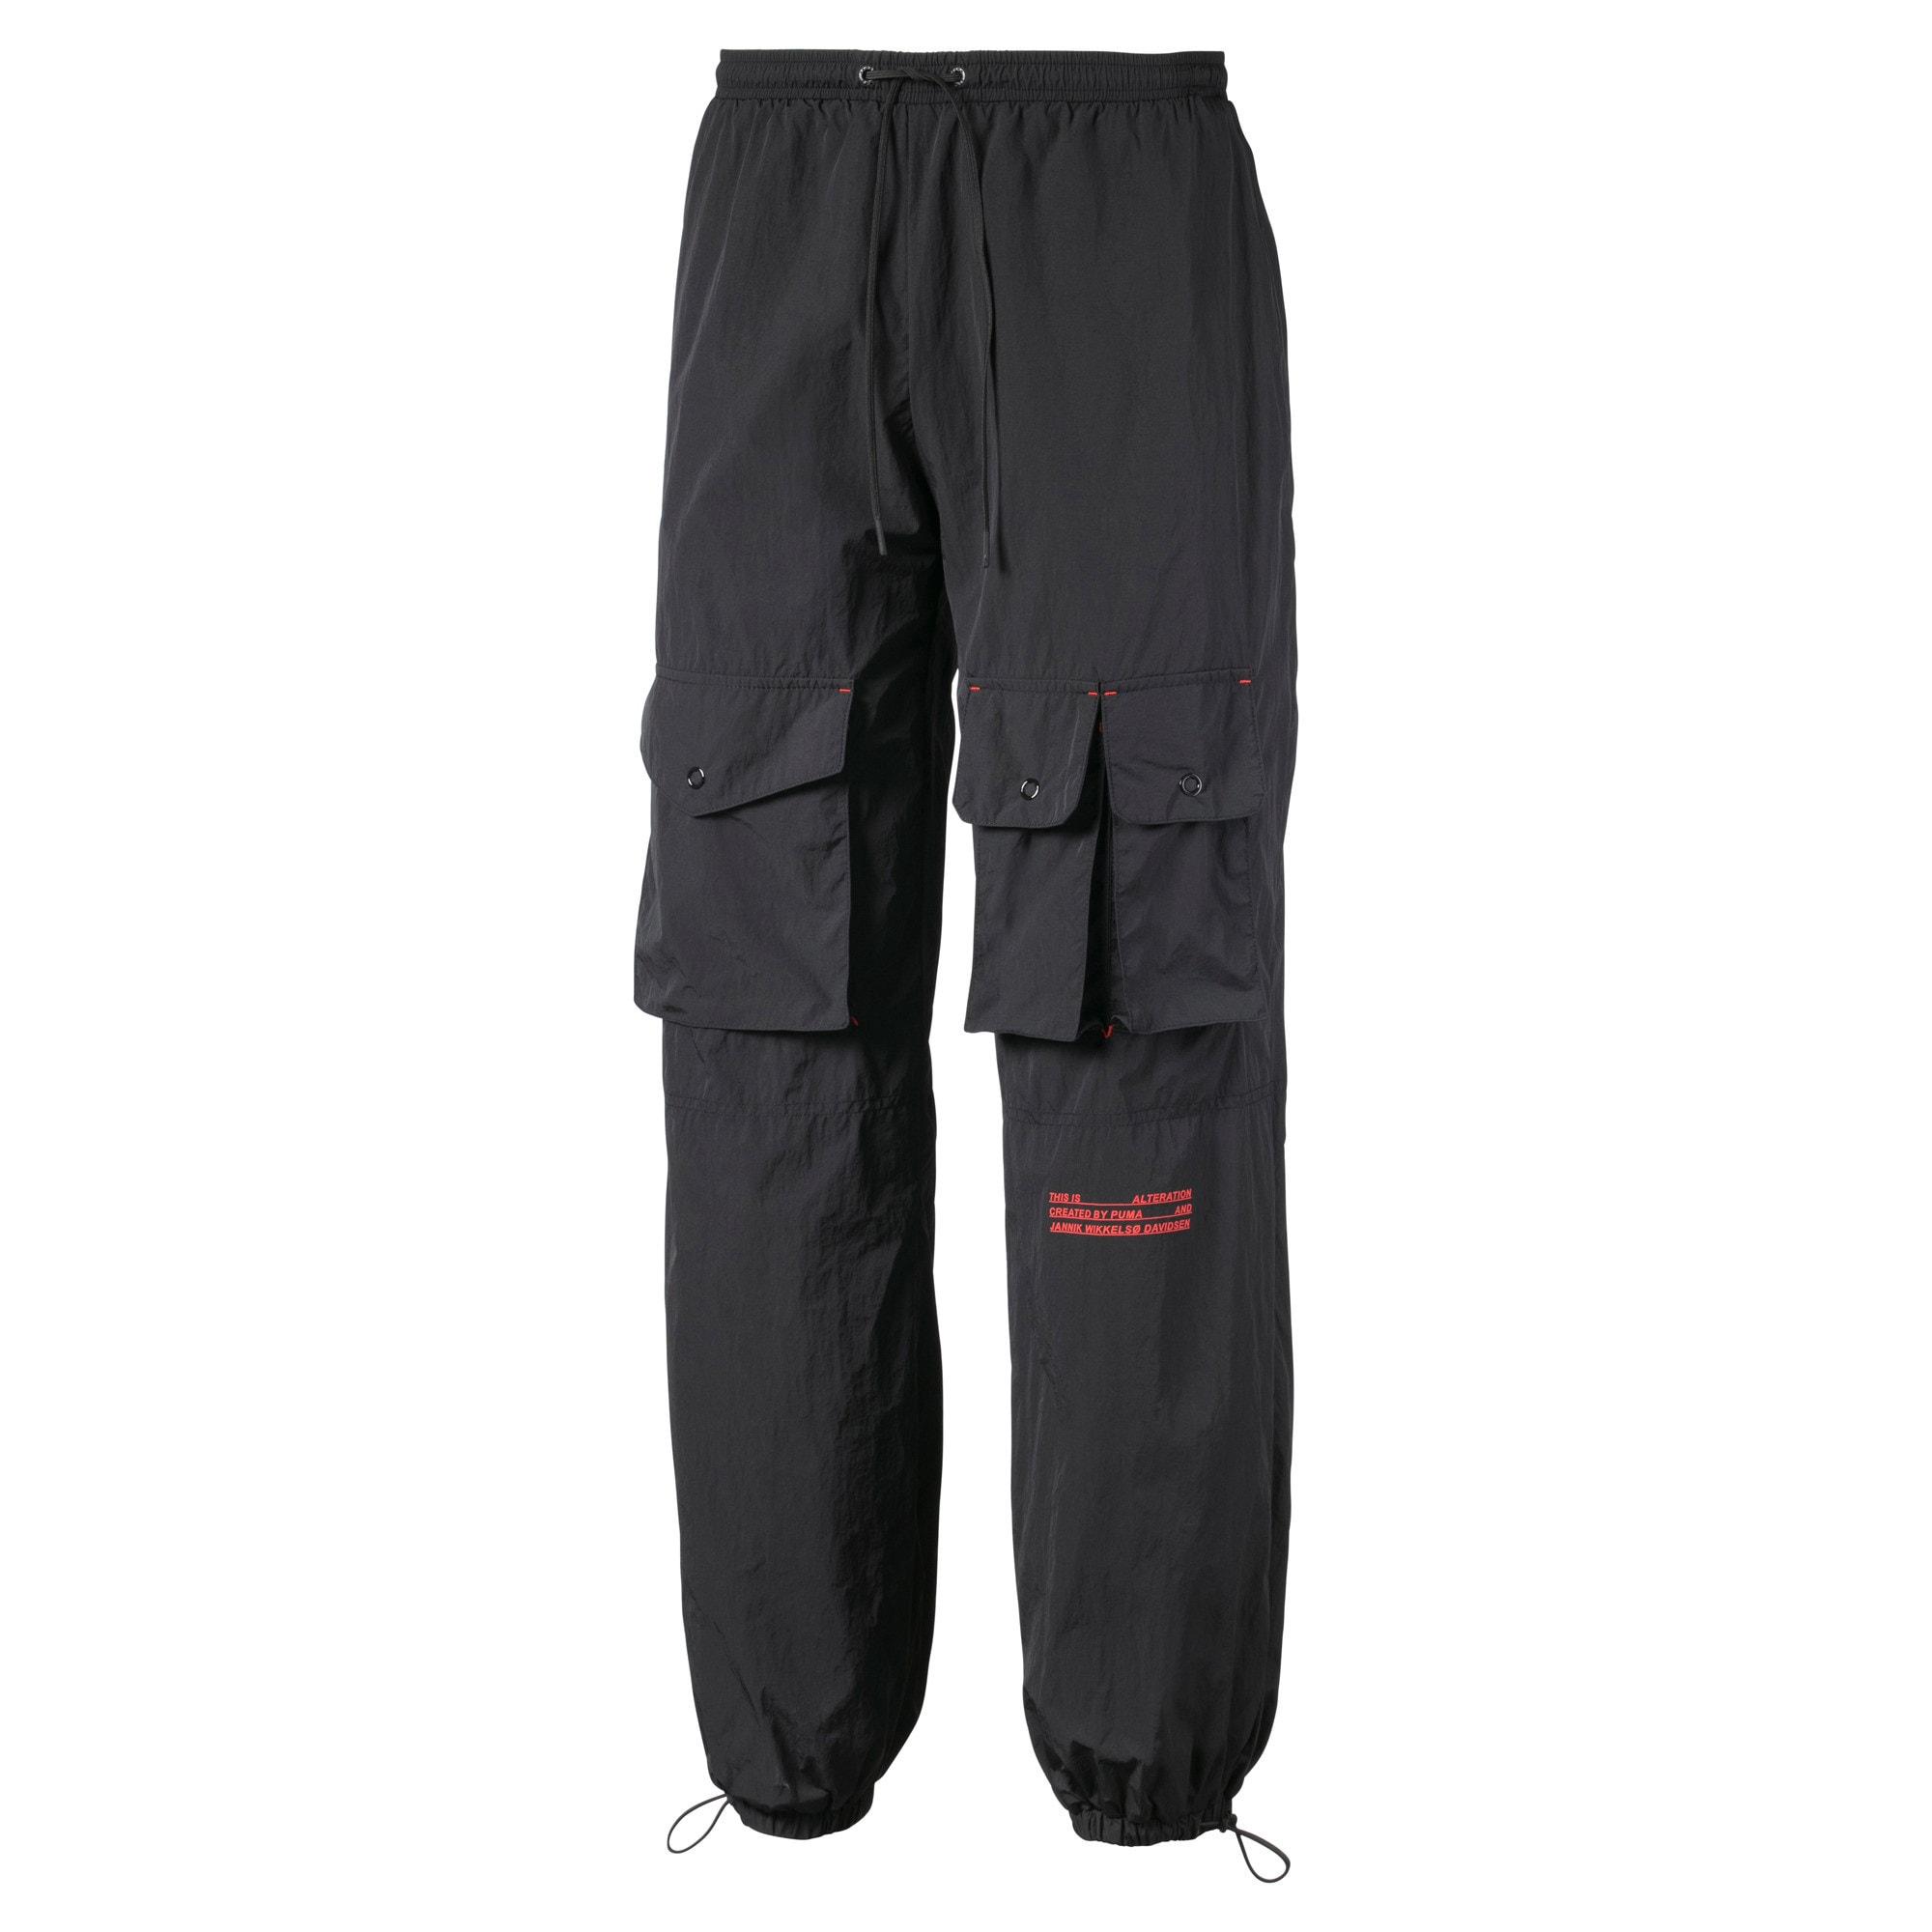 Thumbnail 1 of Alteration Men's Pants, Puma Black, medium